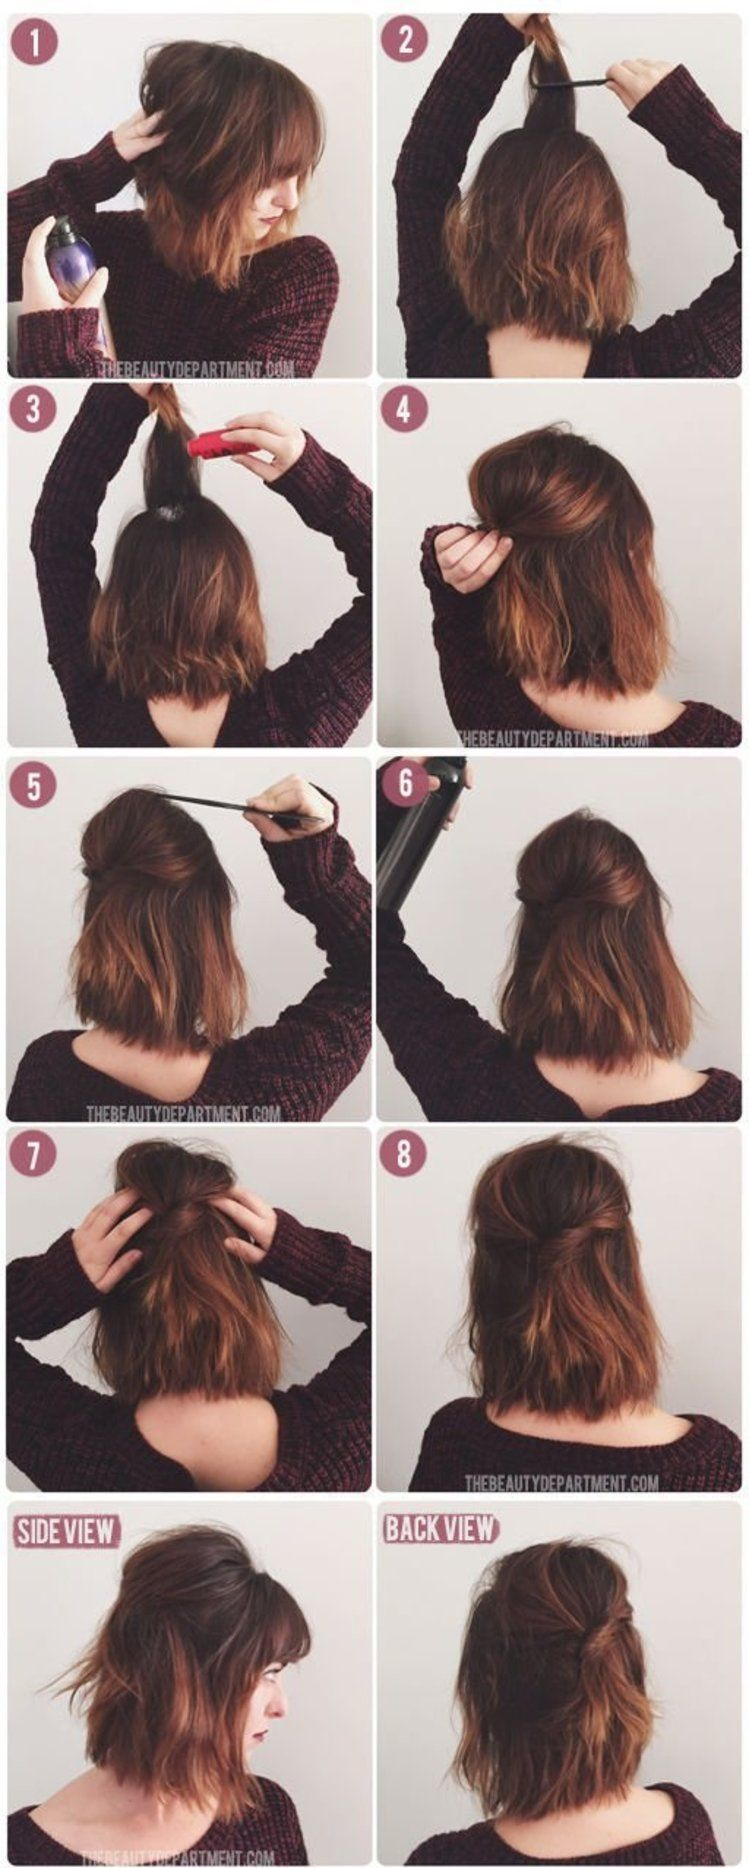 Prosta fryzura krok po kroku opart pinterest hair style hair